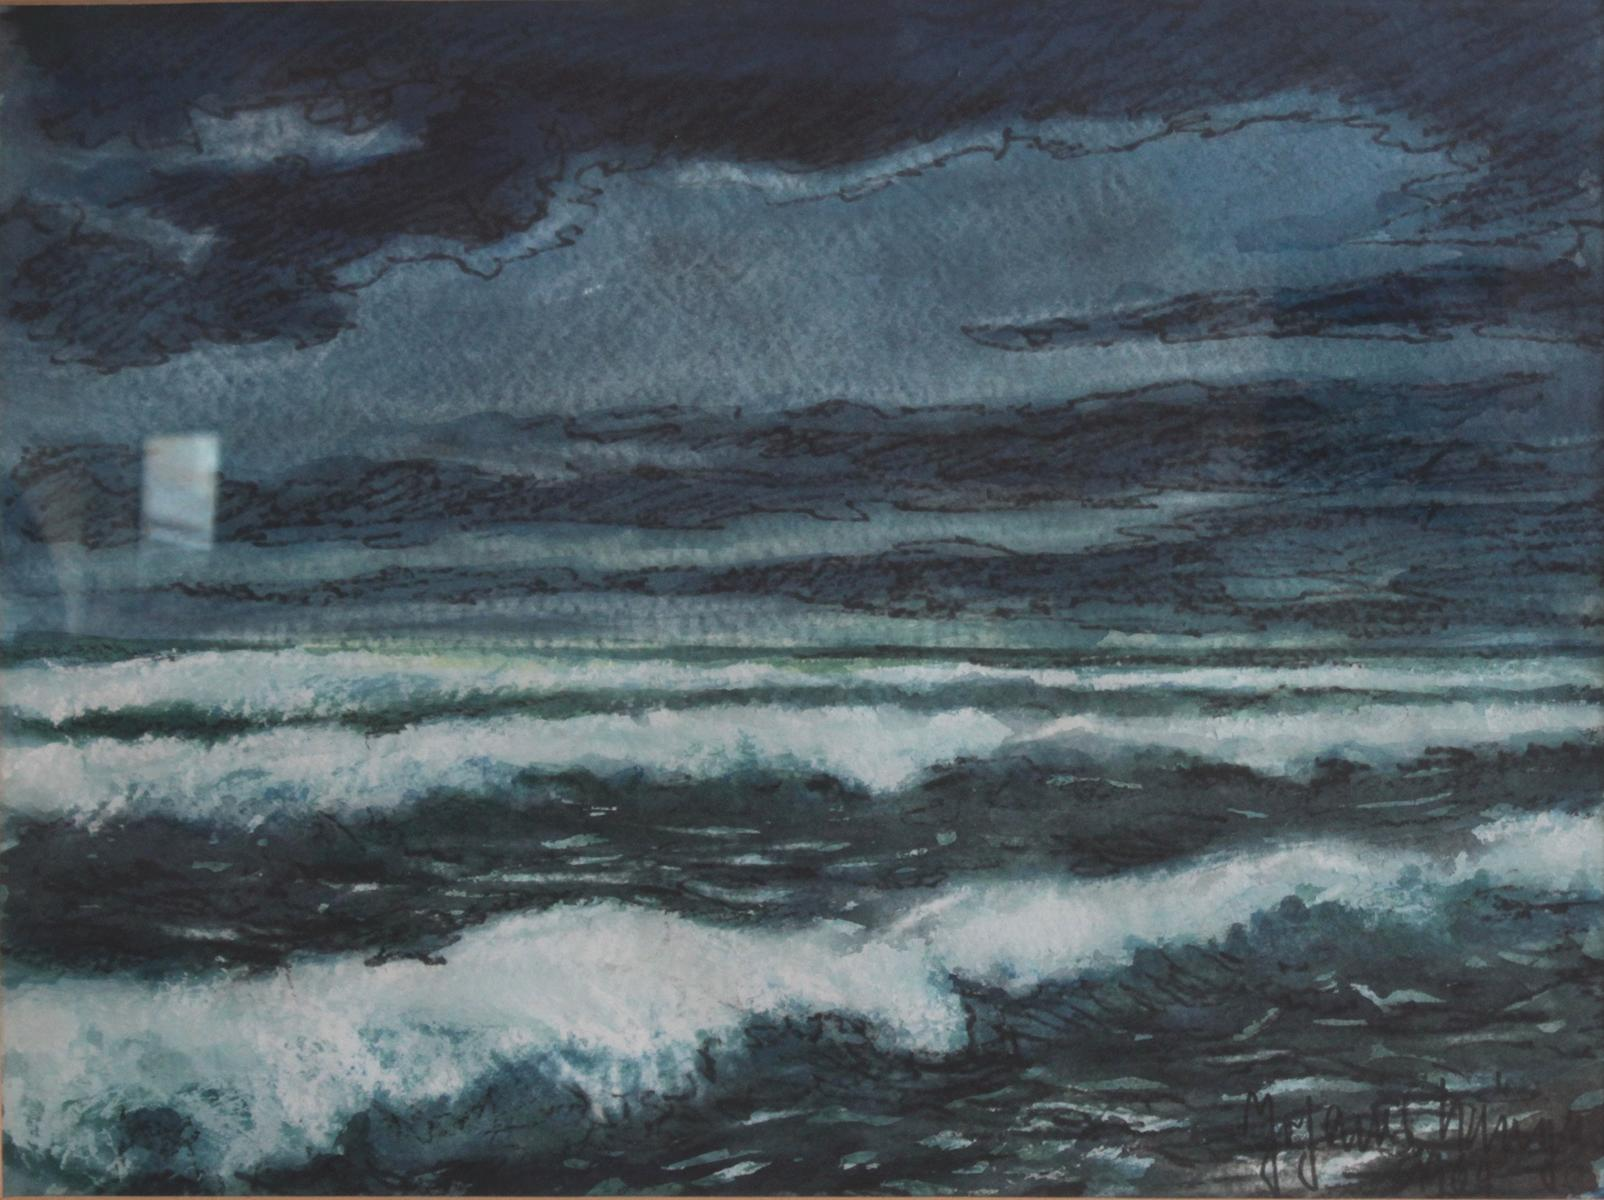 Aquarell, 'Meer'-2